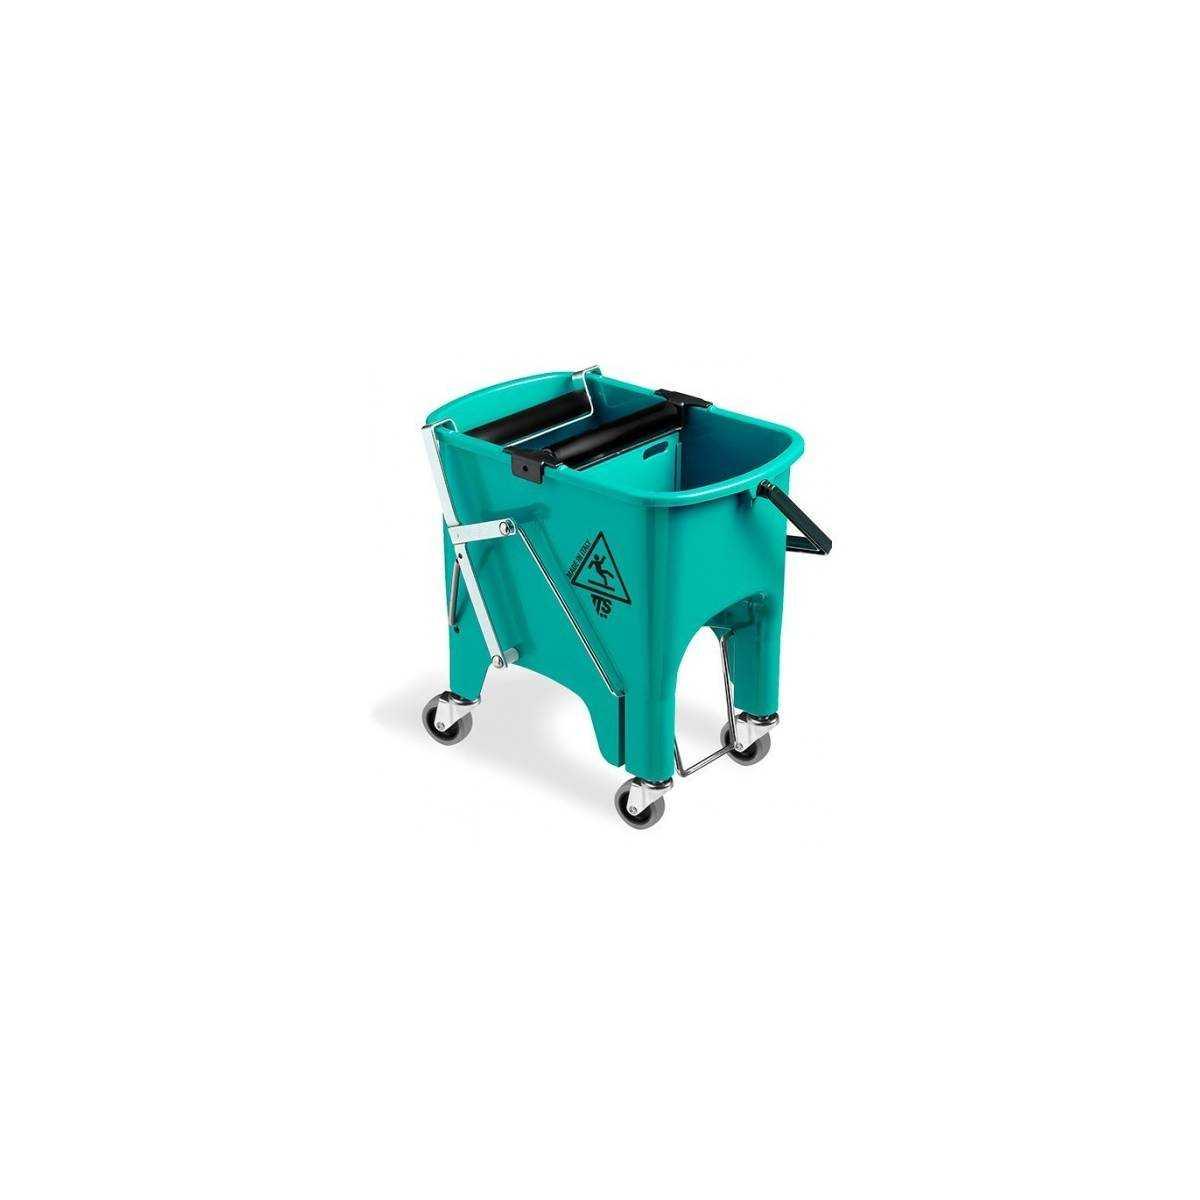 Ведро для уборки с отжимом SQUIZZY 15л на колесах (Зеленого цвета) 0V006415 TTS